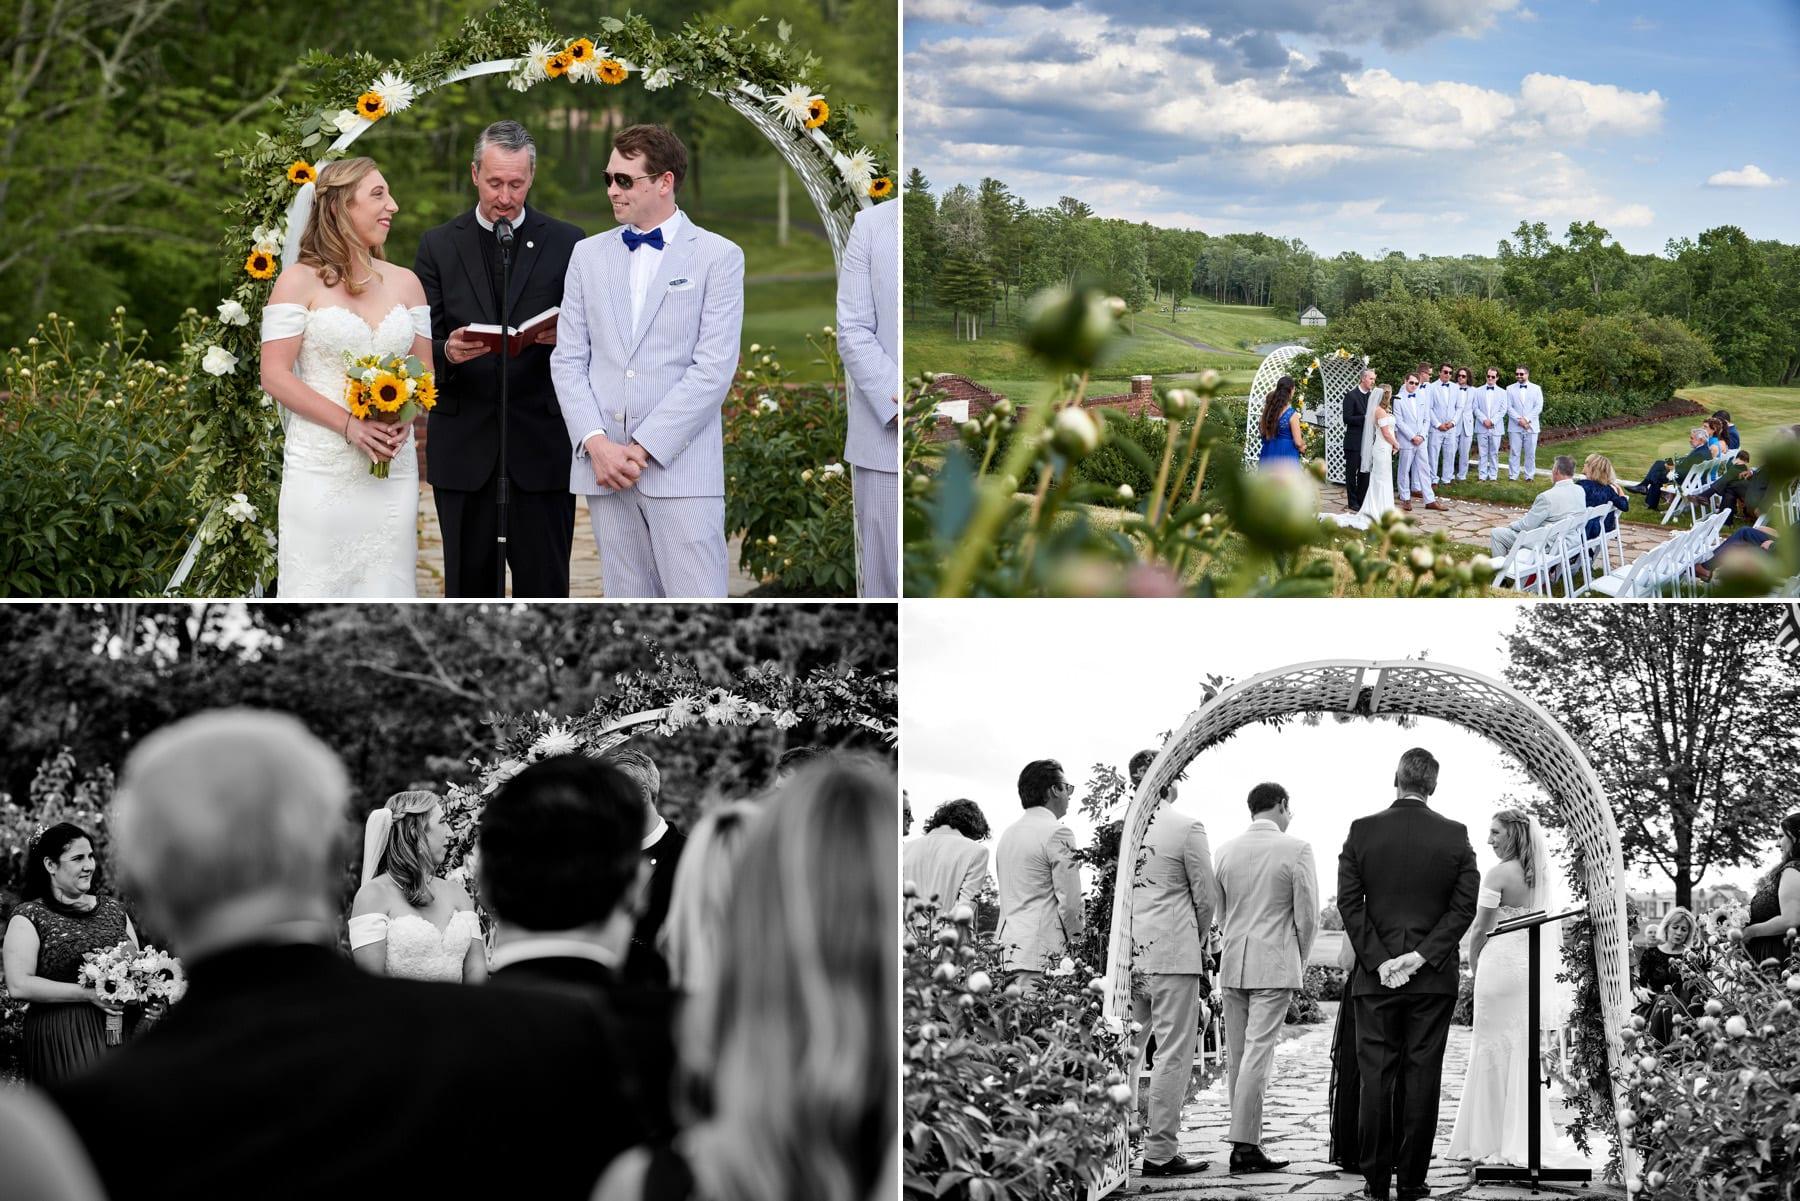 wedding ceremony photos at Hamilton Farm Golf Club